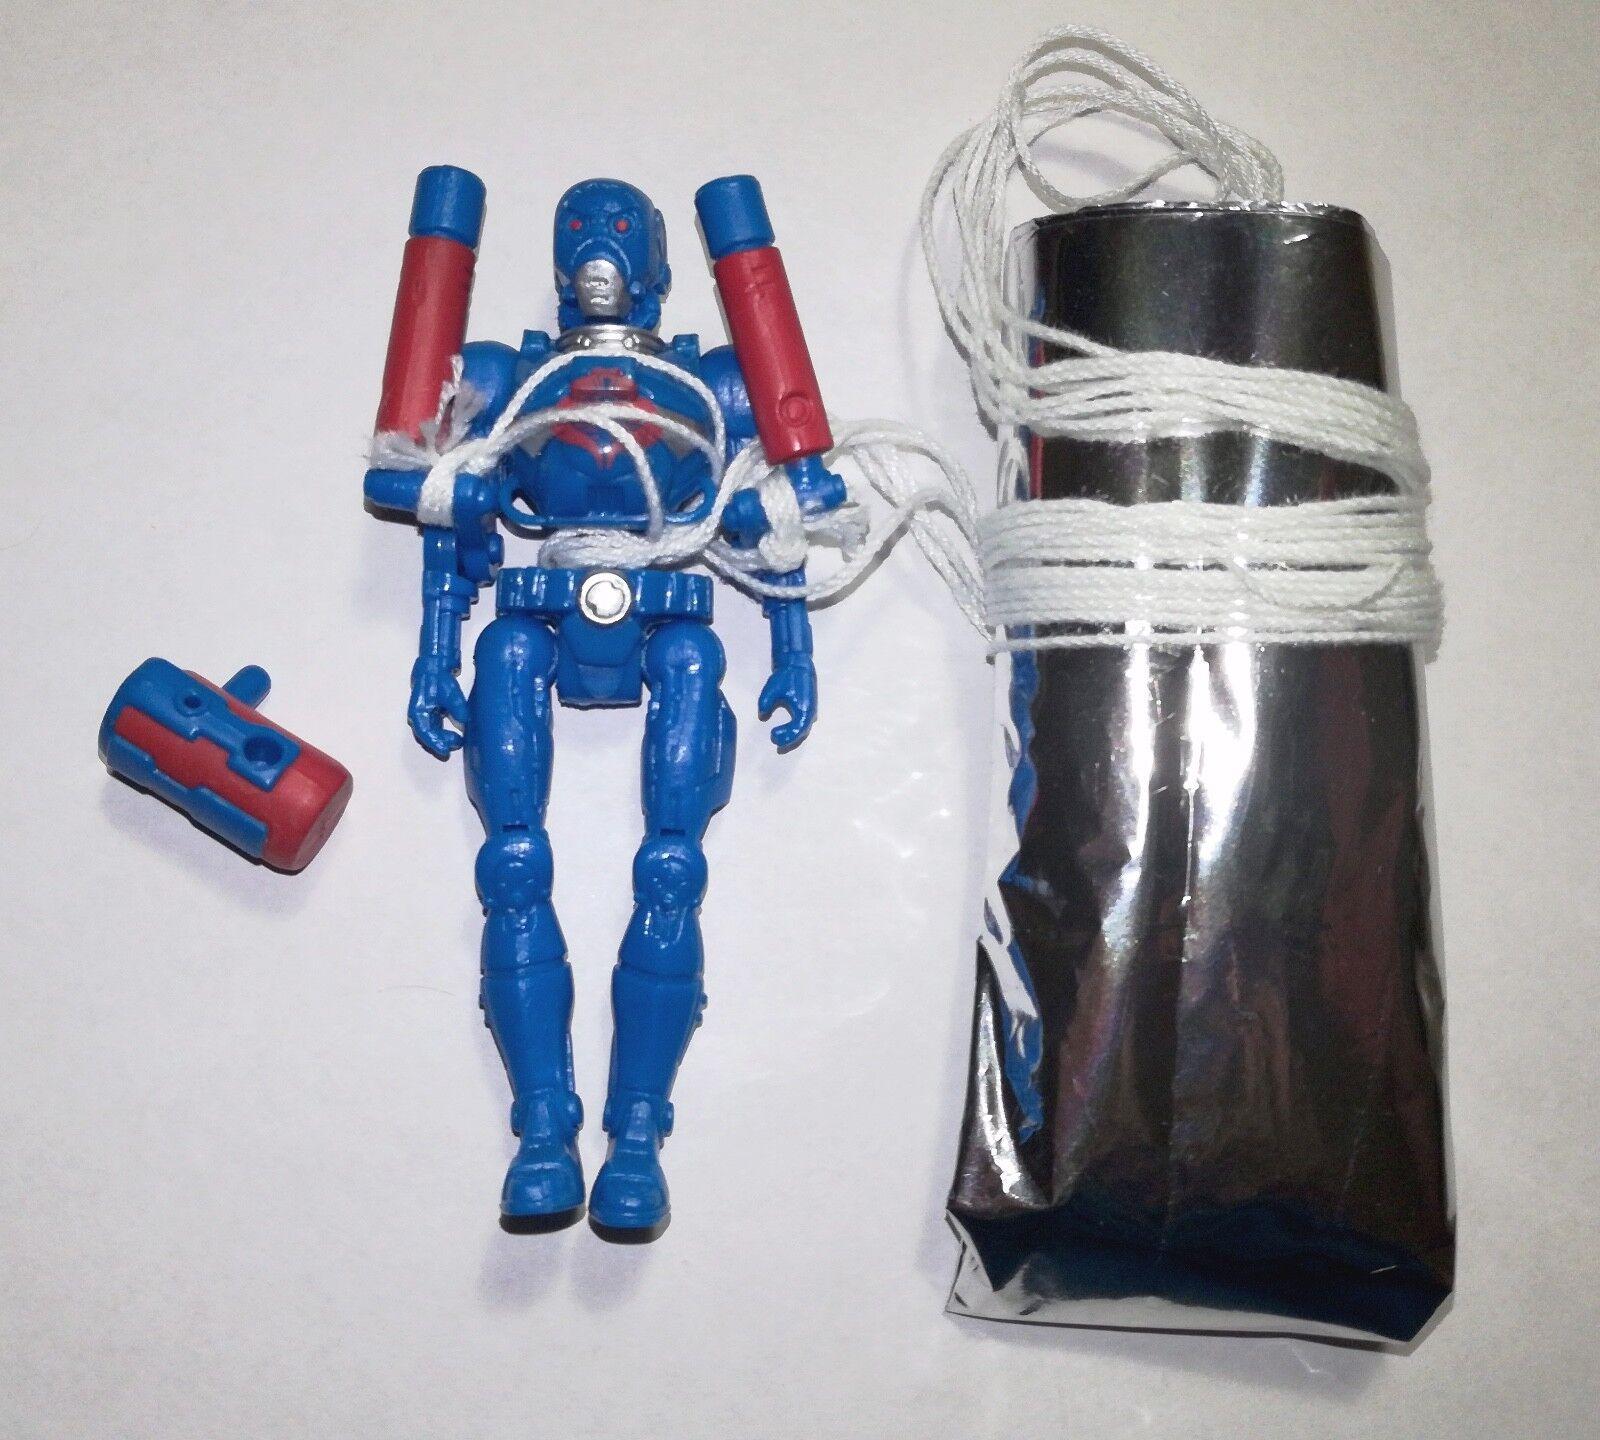 G.I. Joe Cobra Sky Sky Sky Bat B.A.T. Parachute Figure Joe Con 2008 Convention Exclusive 9ab3cd